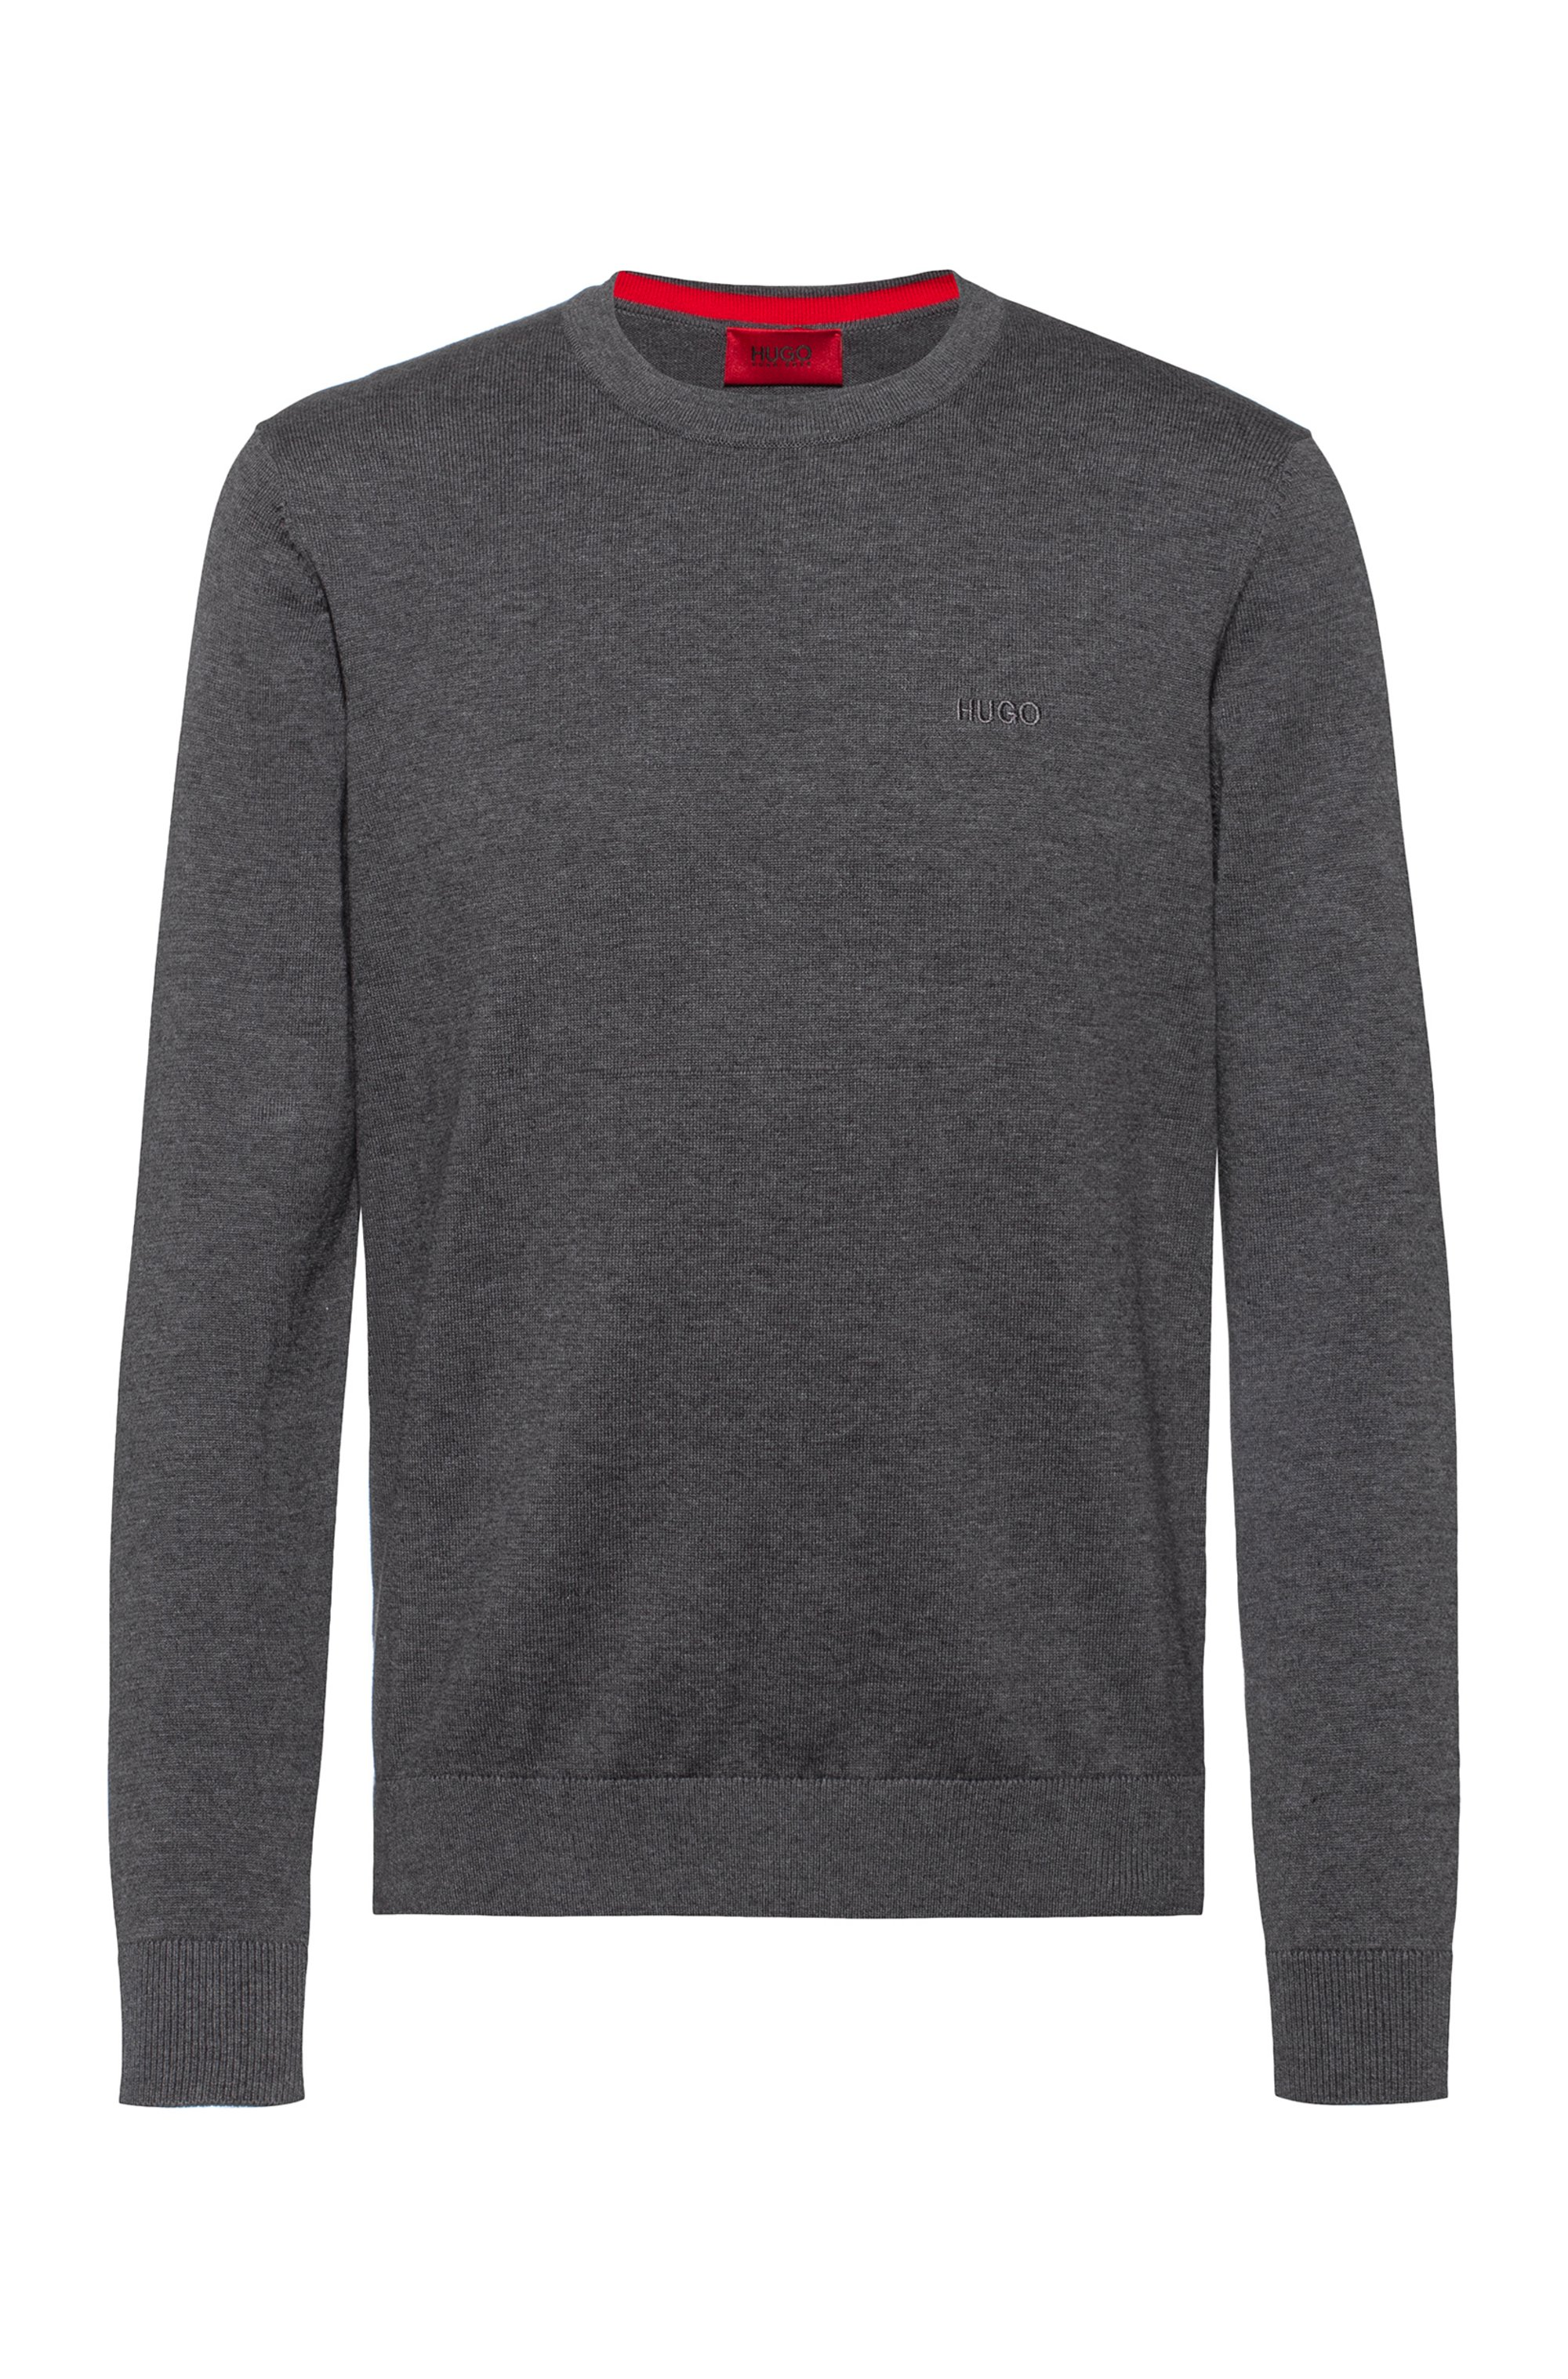 Crew-neck sweater in pure cotton with tonal logo, Dark Grey